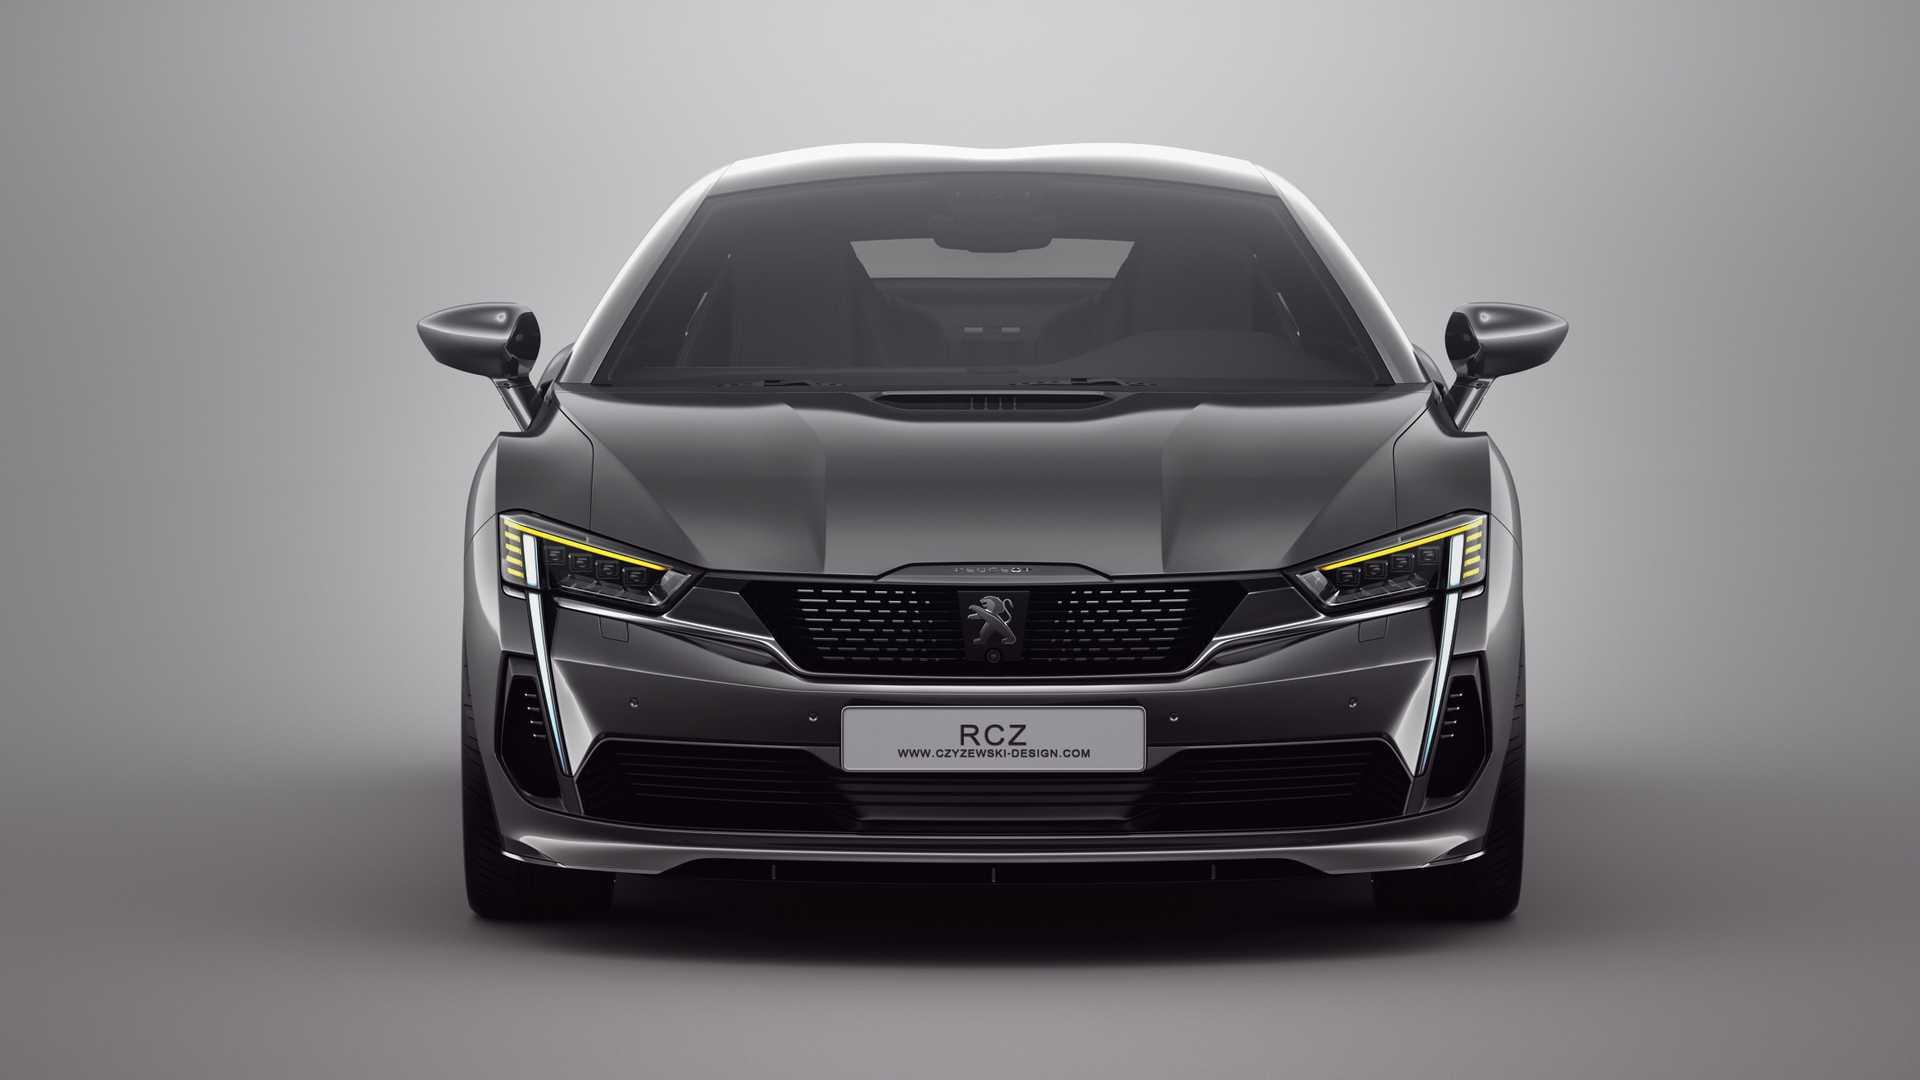 2020_Peugeot_RCZ_rendering_0009